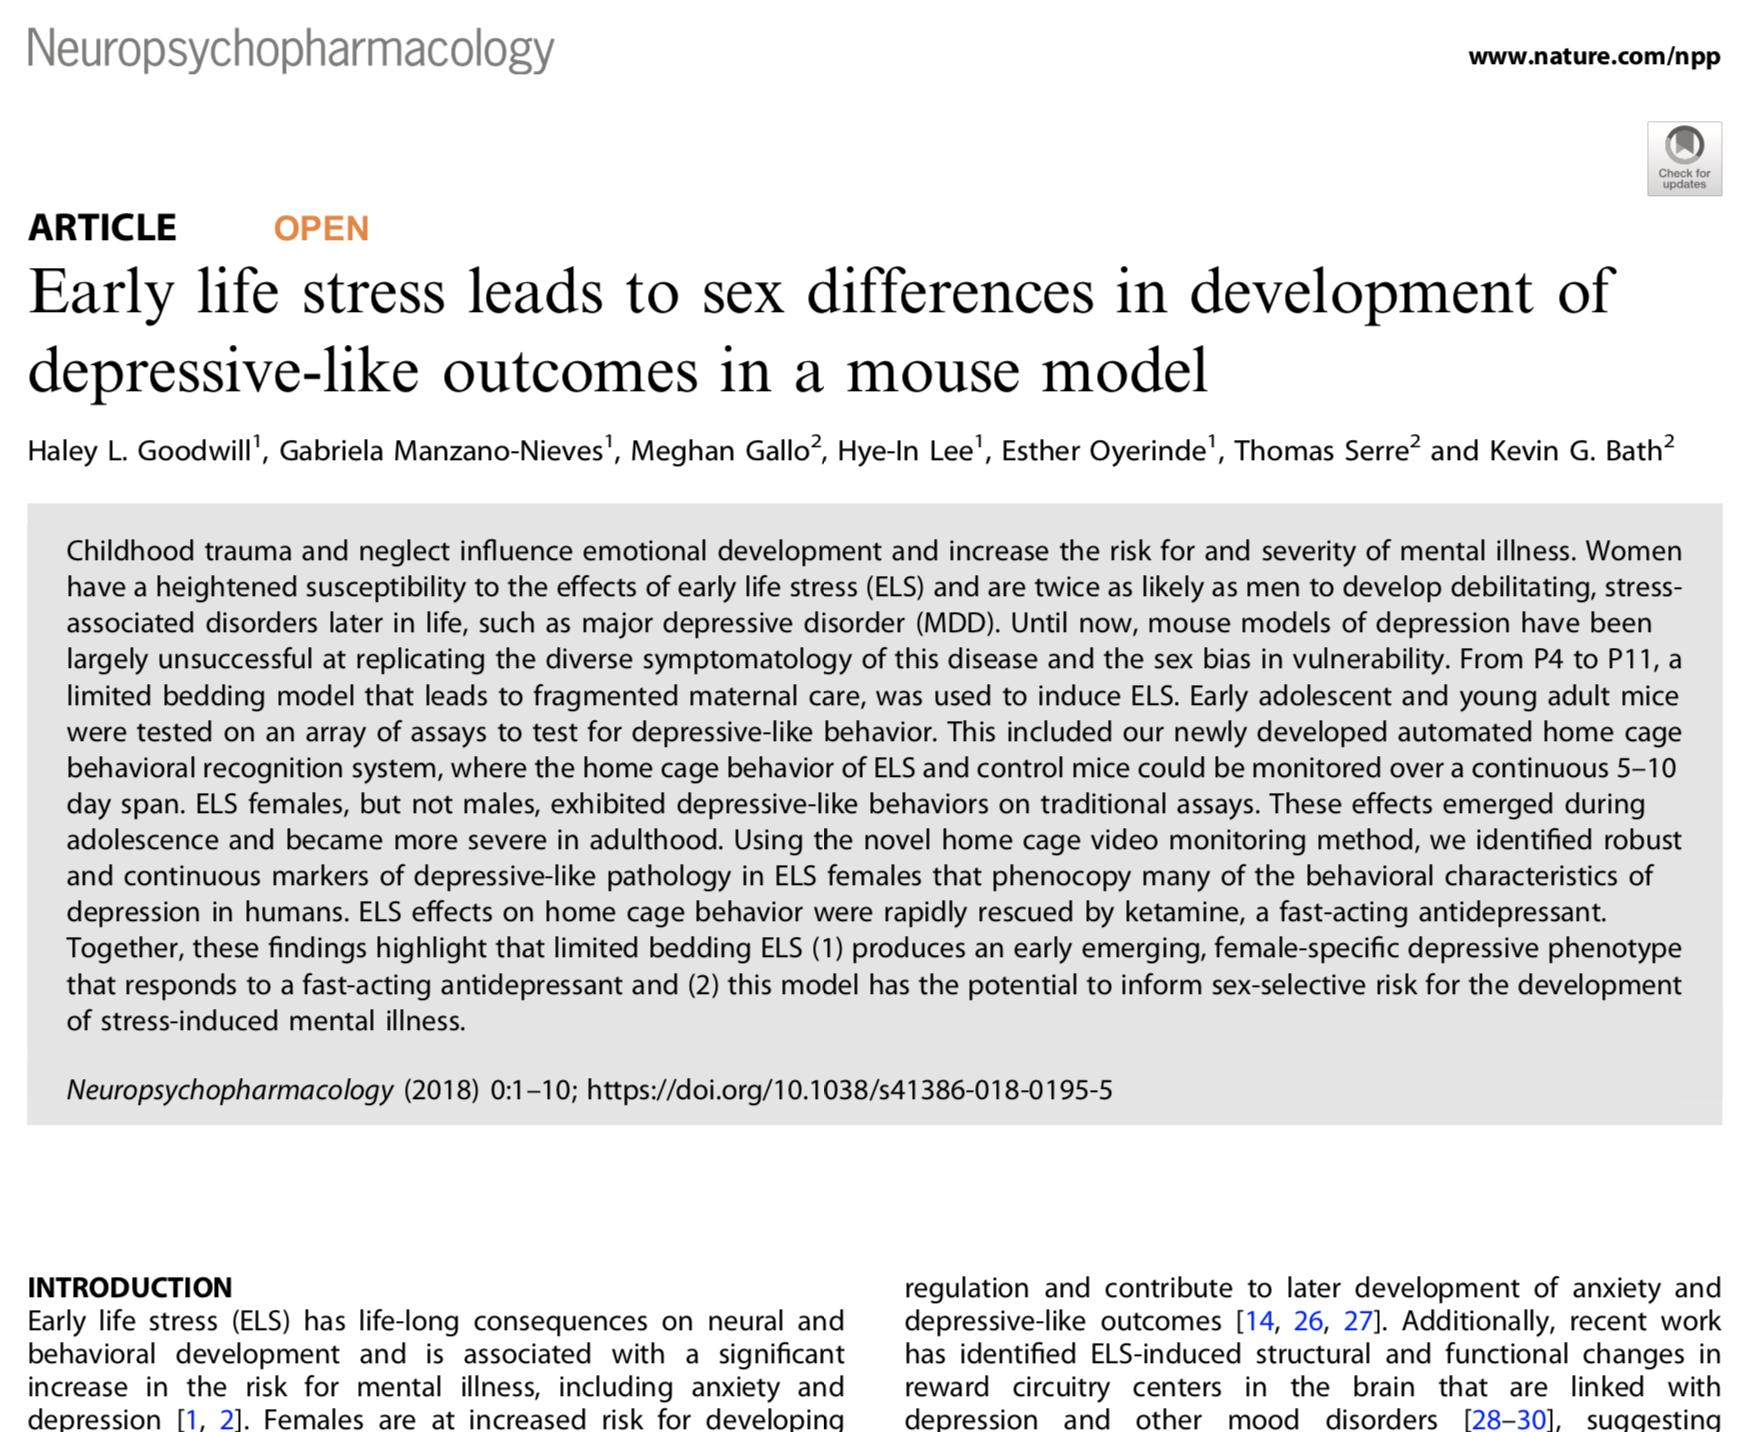 Goodwill et al., 2018.   Neuropsychopharmacology.